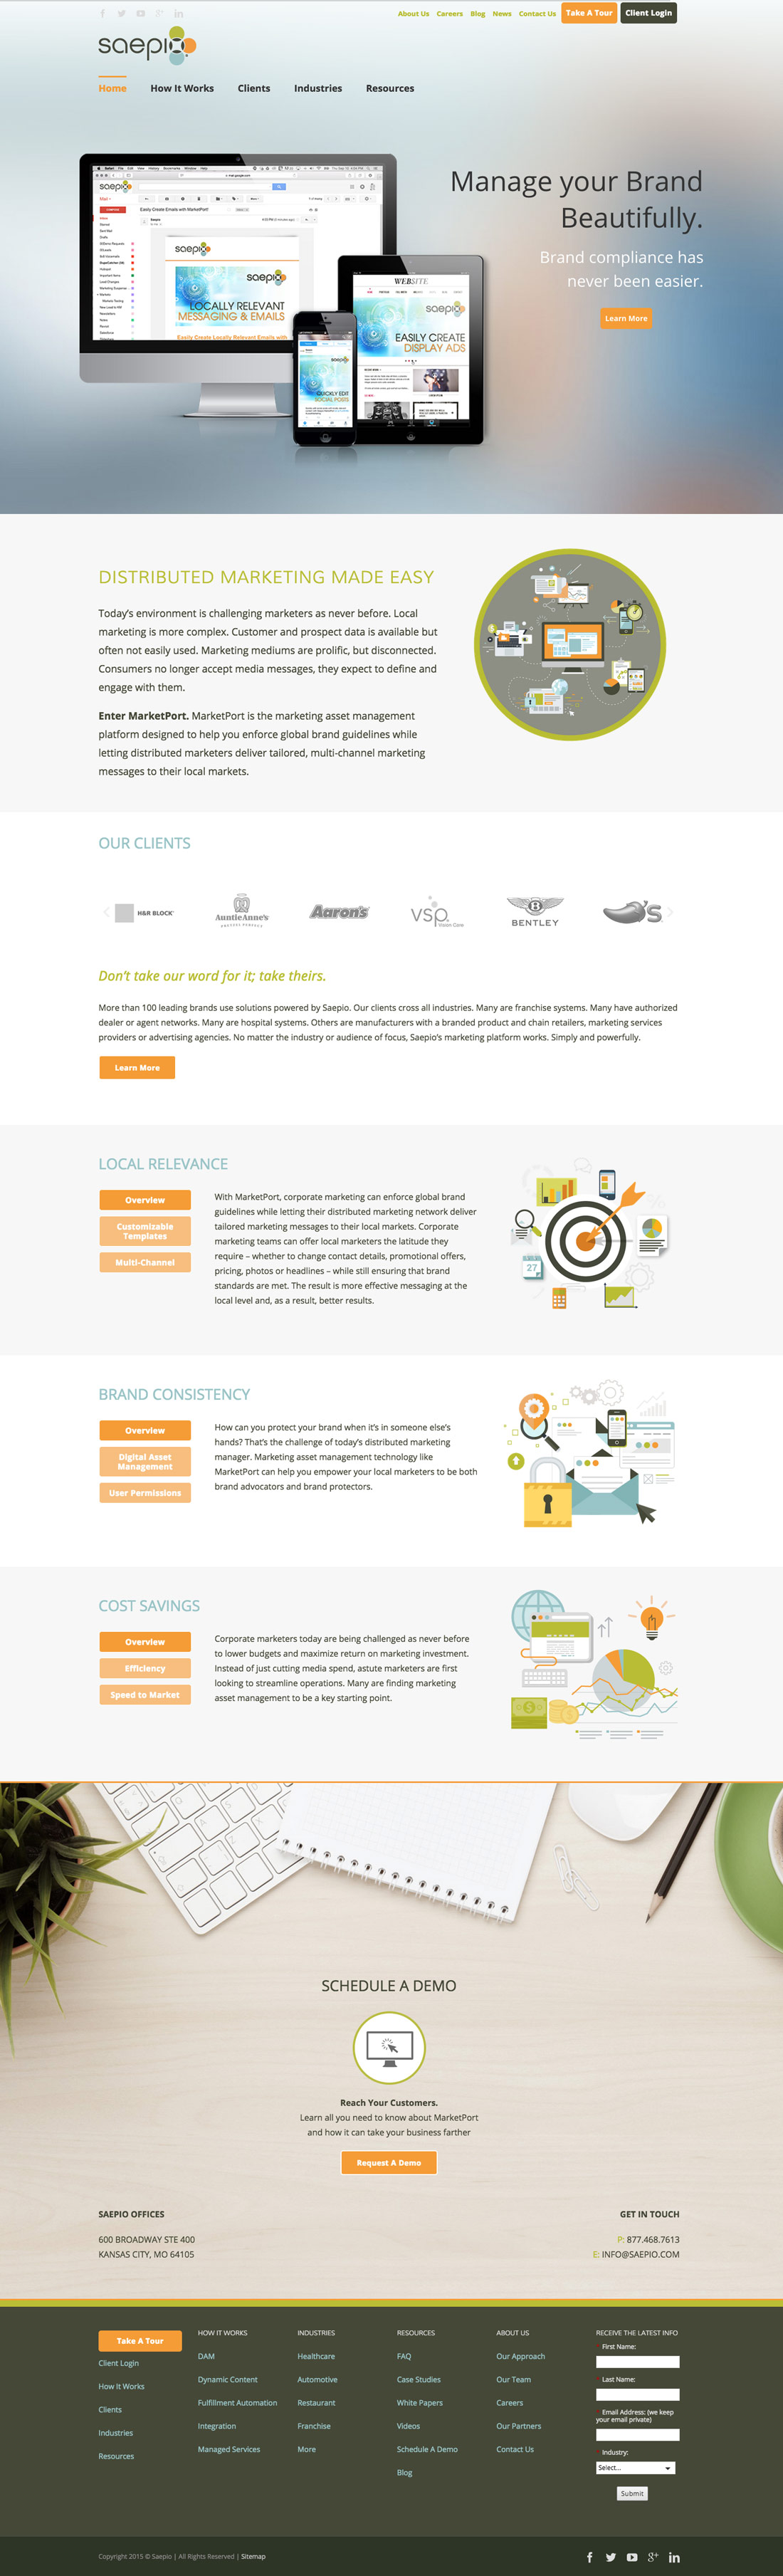 Homepage Saepio Website Design